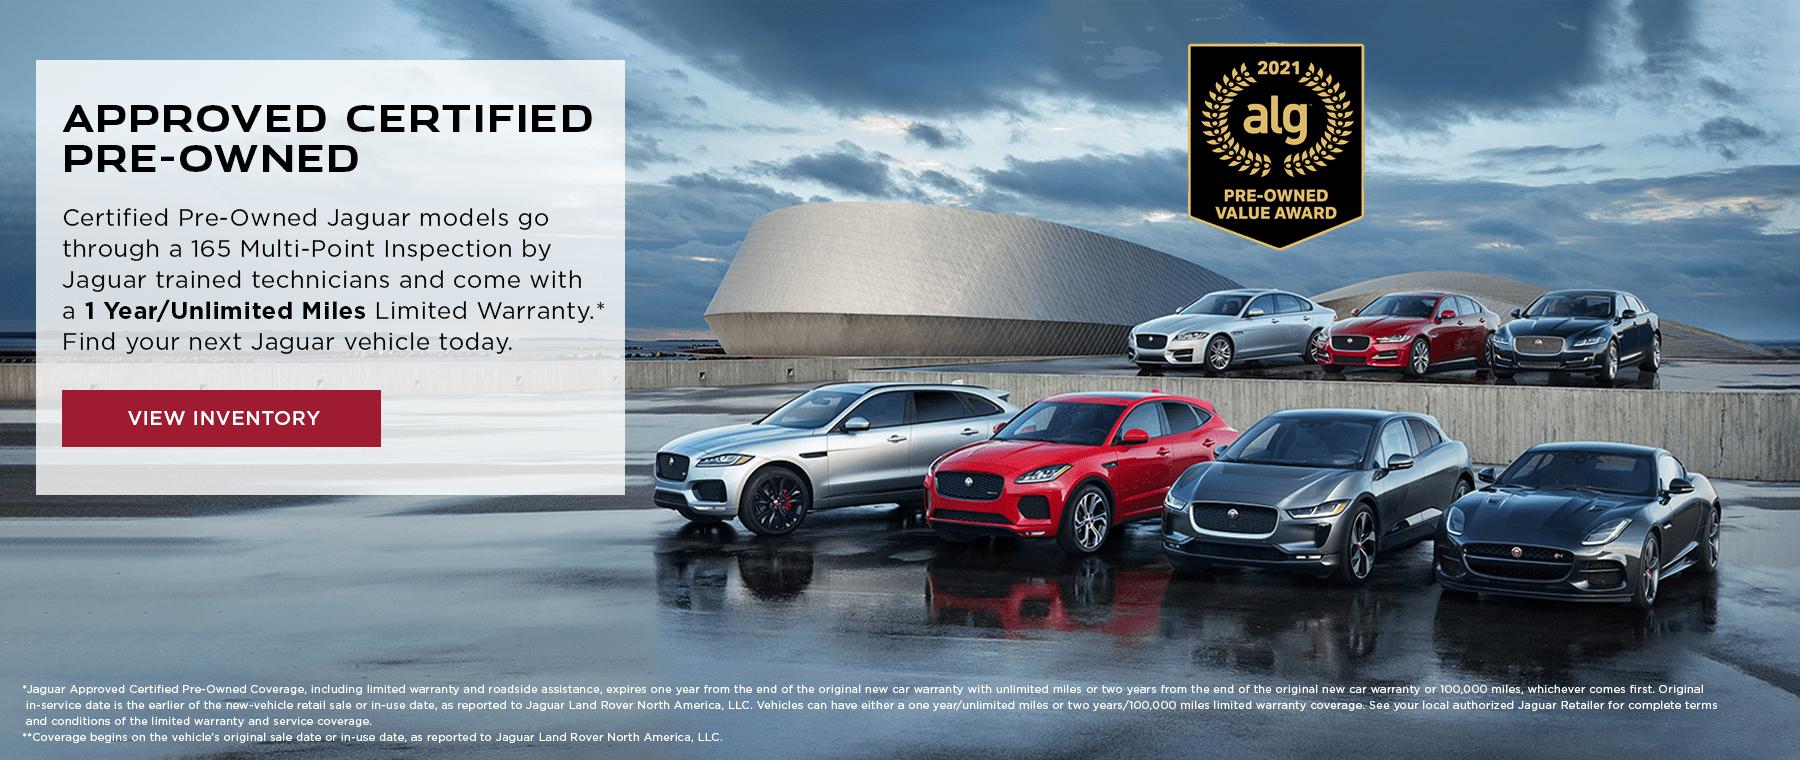 Jaguar Certified Pre-Owned Vehicles